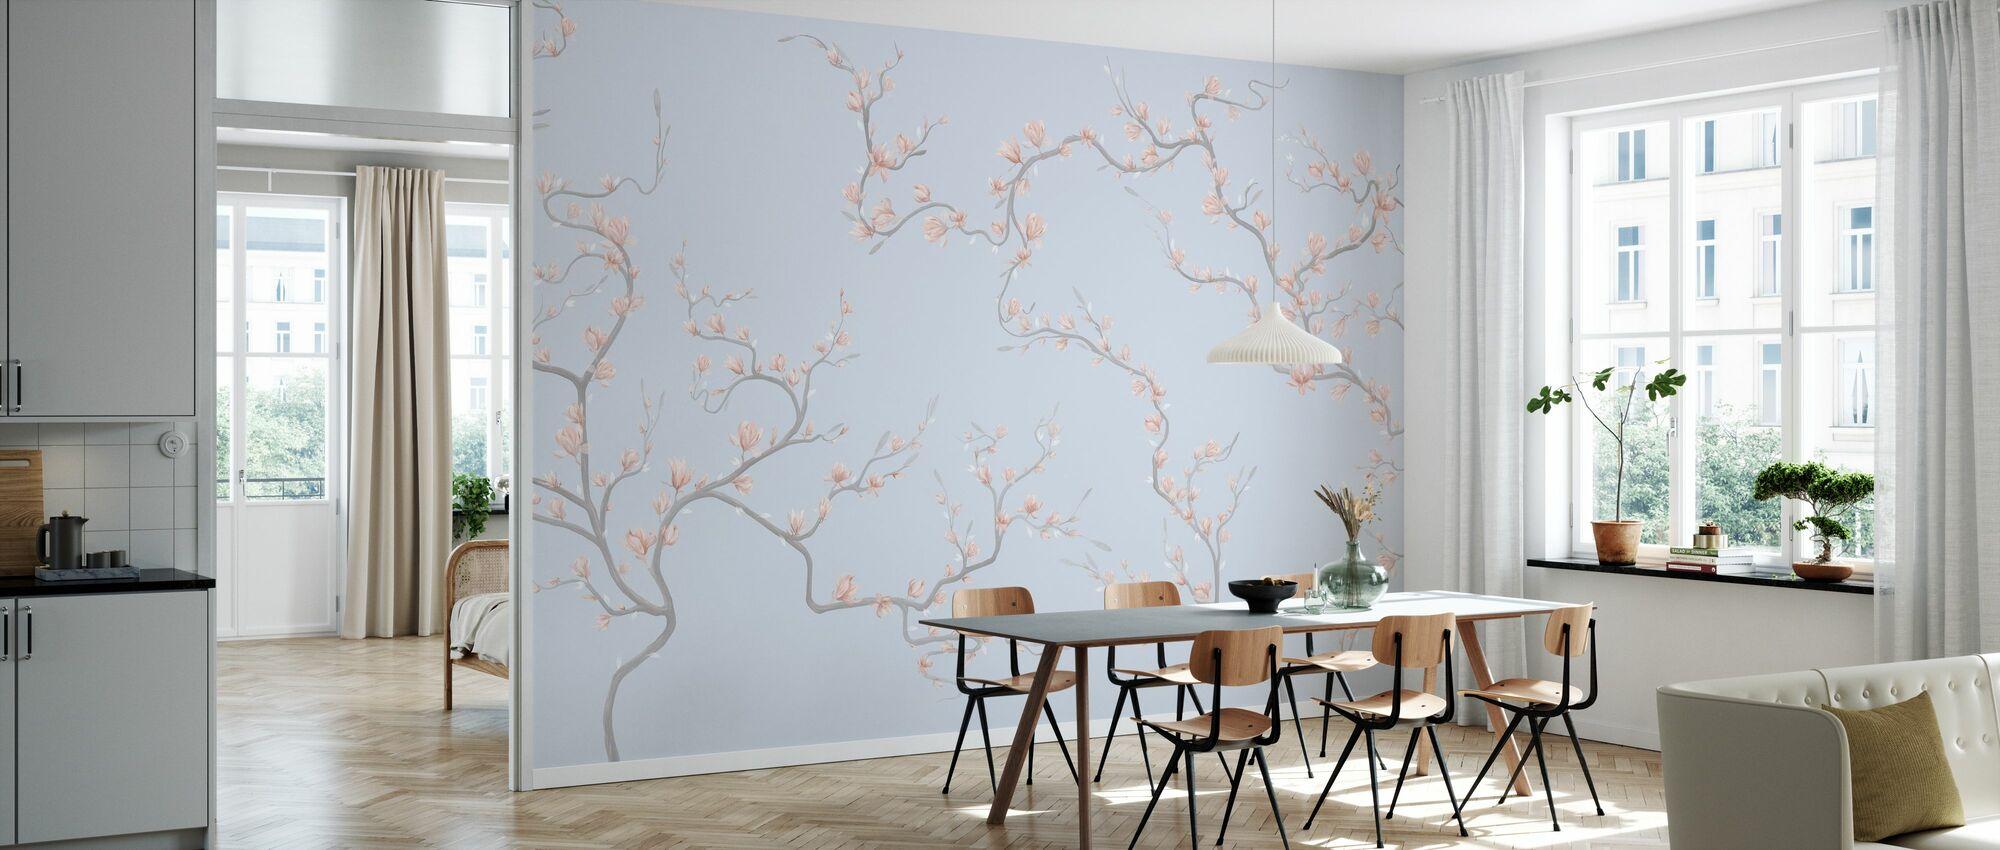 Flourishing Magnolia - Pale Blue - Wallpaper - Kitchen